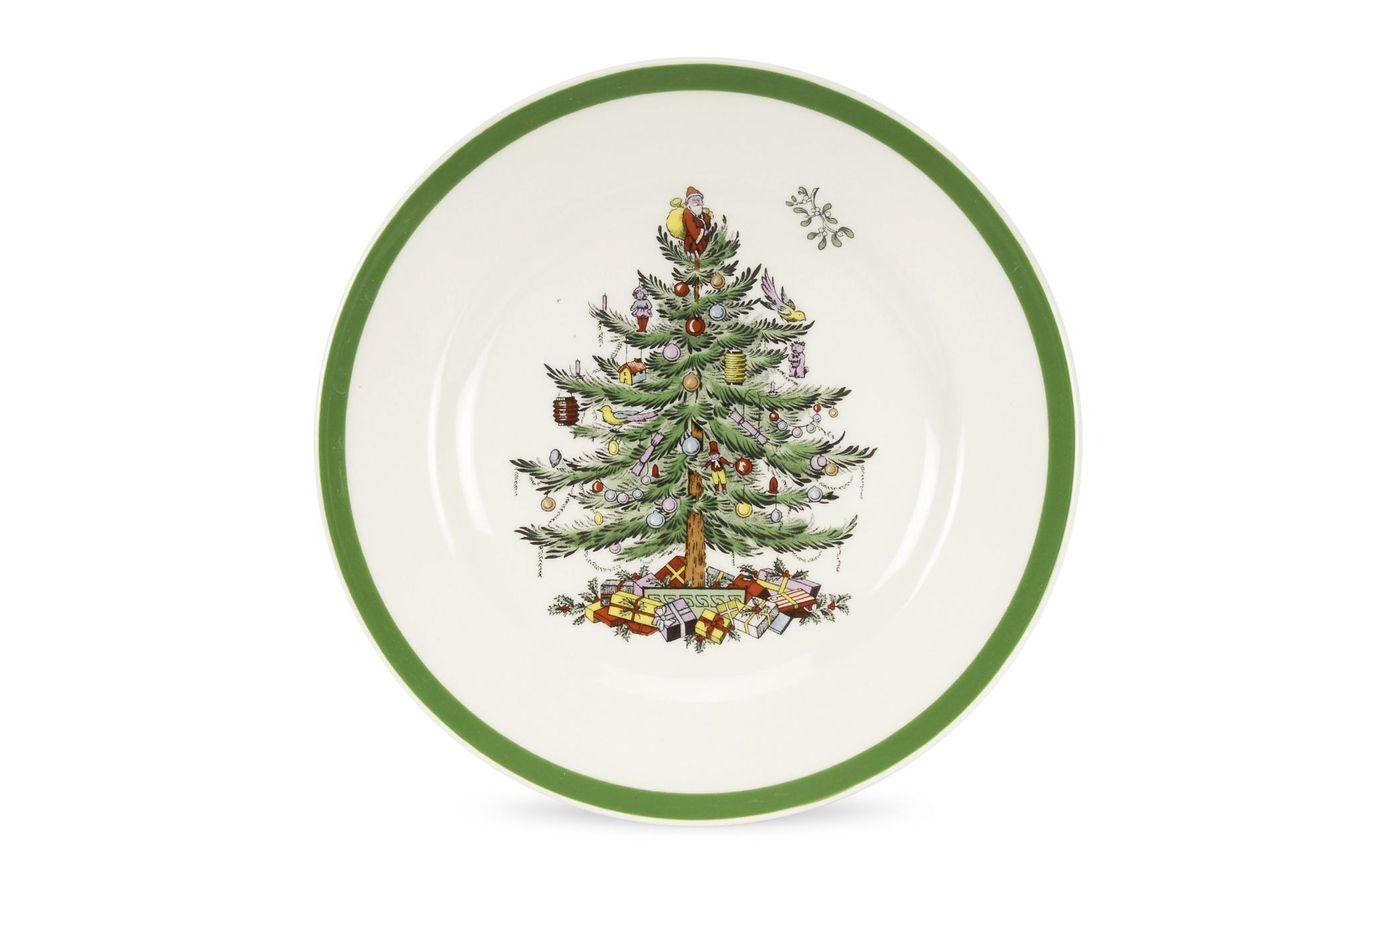 "Spode Christmas Tree Starter / Salad / Dessert Plate 7 3/4"" thumb 1"